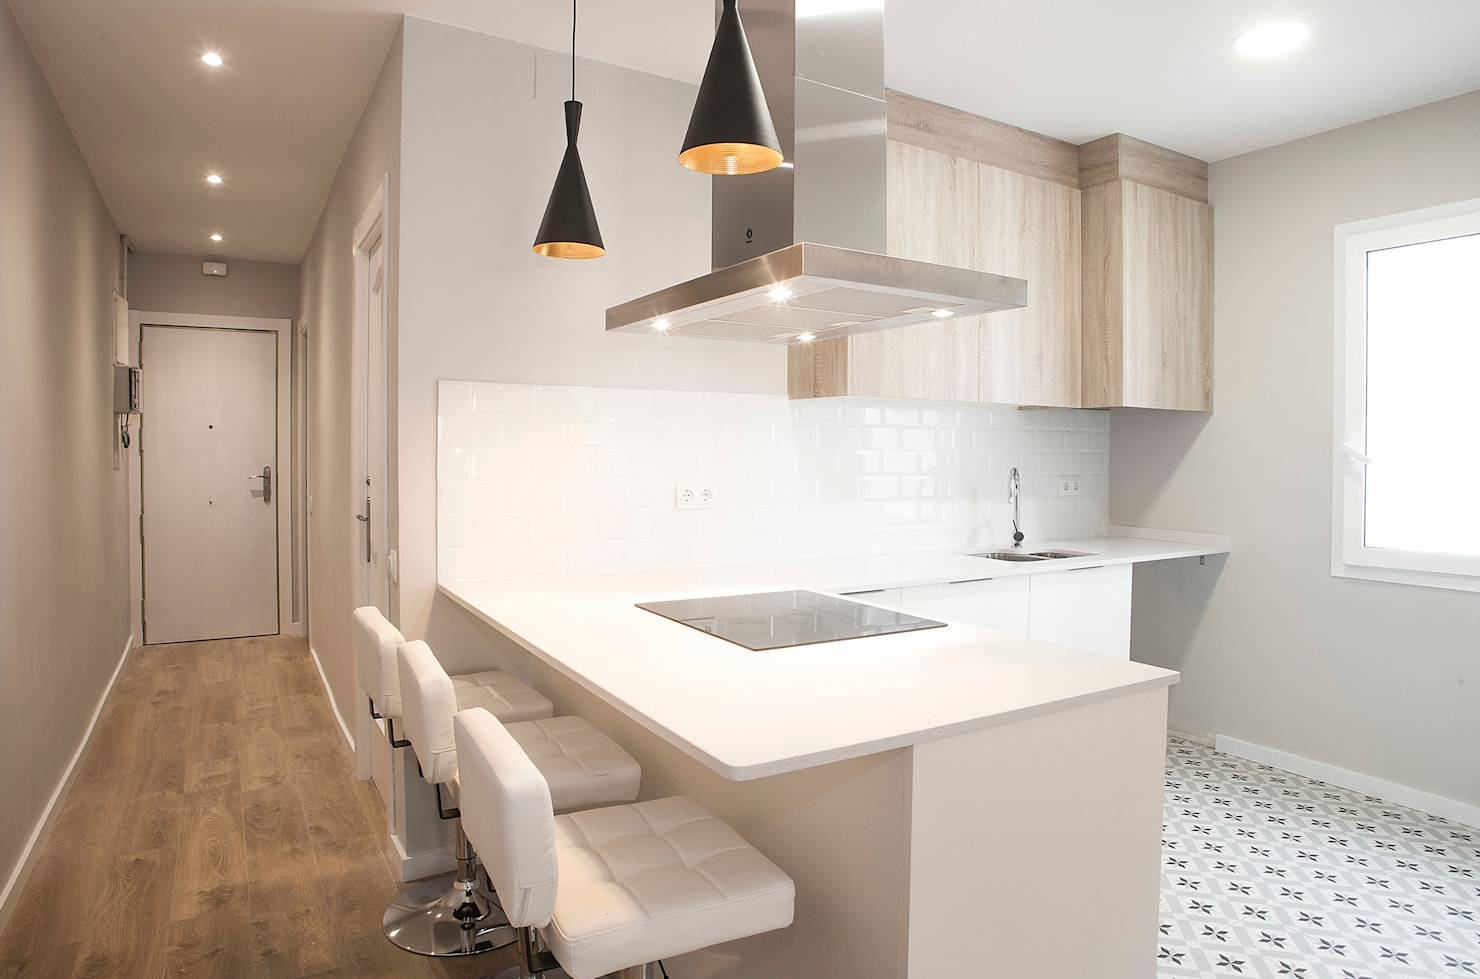 Colores neutros para un piso en Barcelona ¡perfecto!